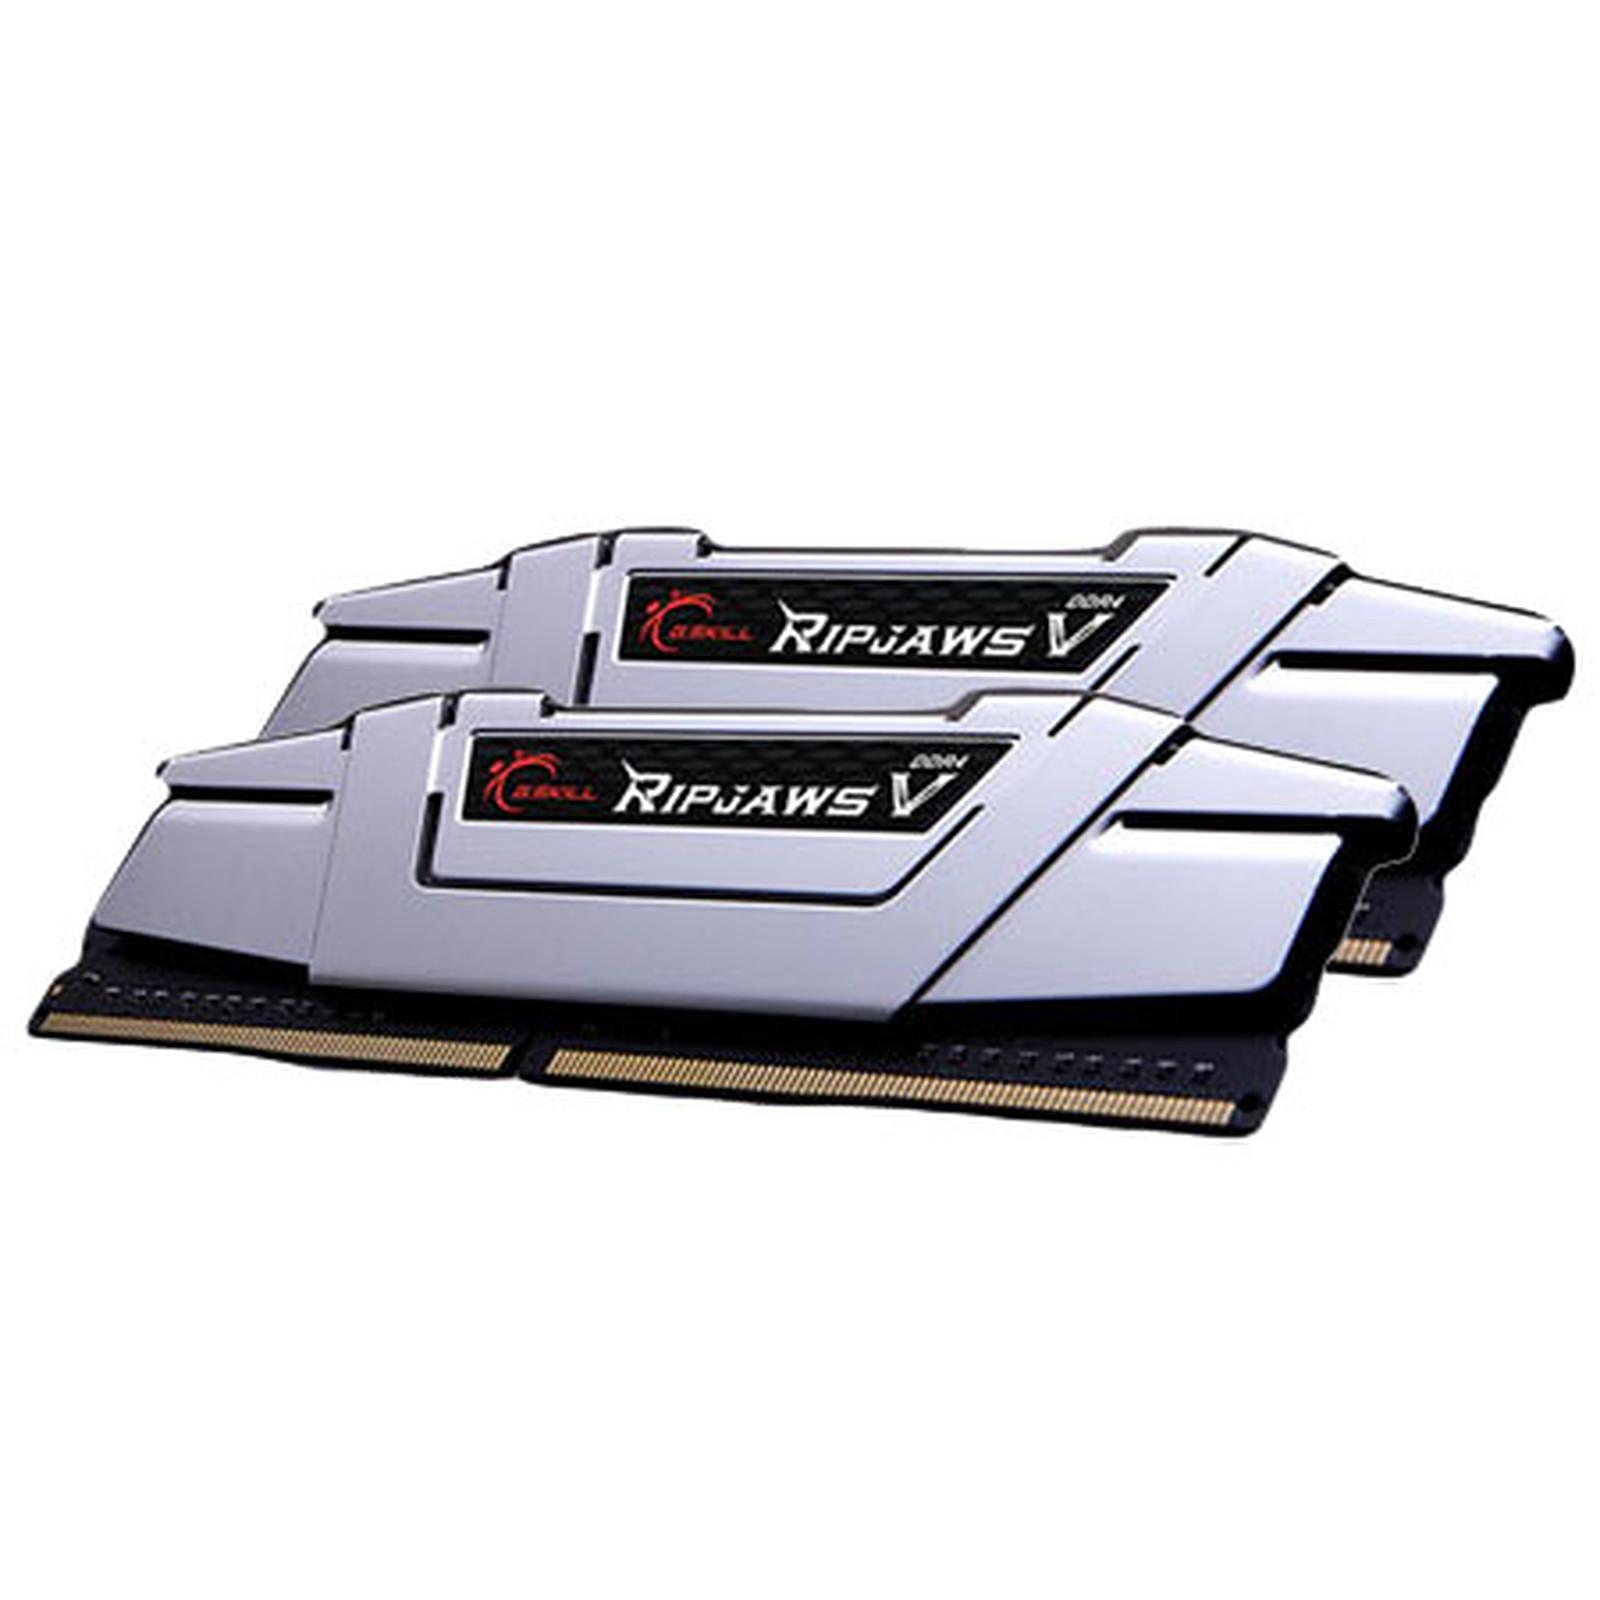 G.Skill RipJaws 5 Series Argent 16 Go (2x 8 Go) DDR4 2666 MHz CL15